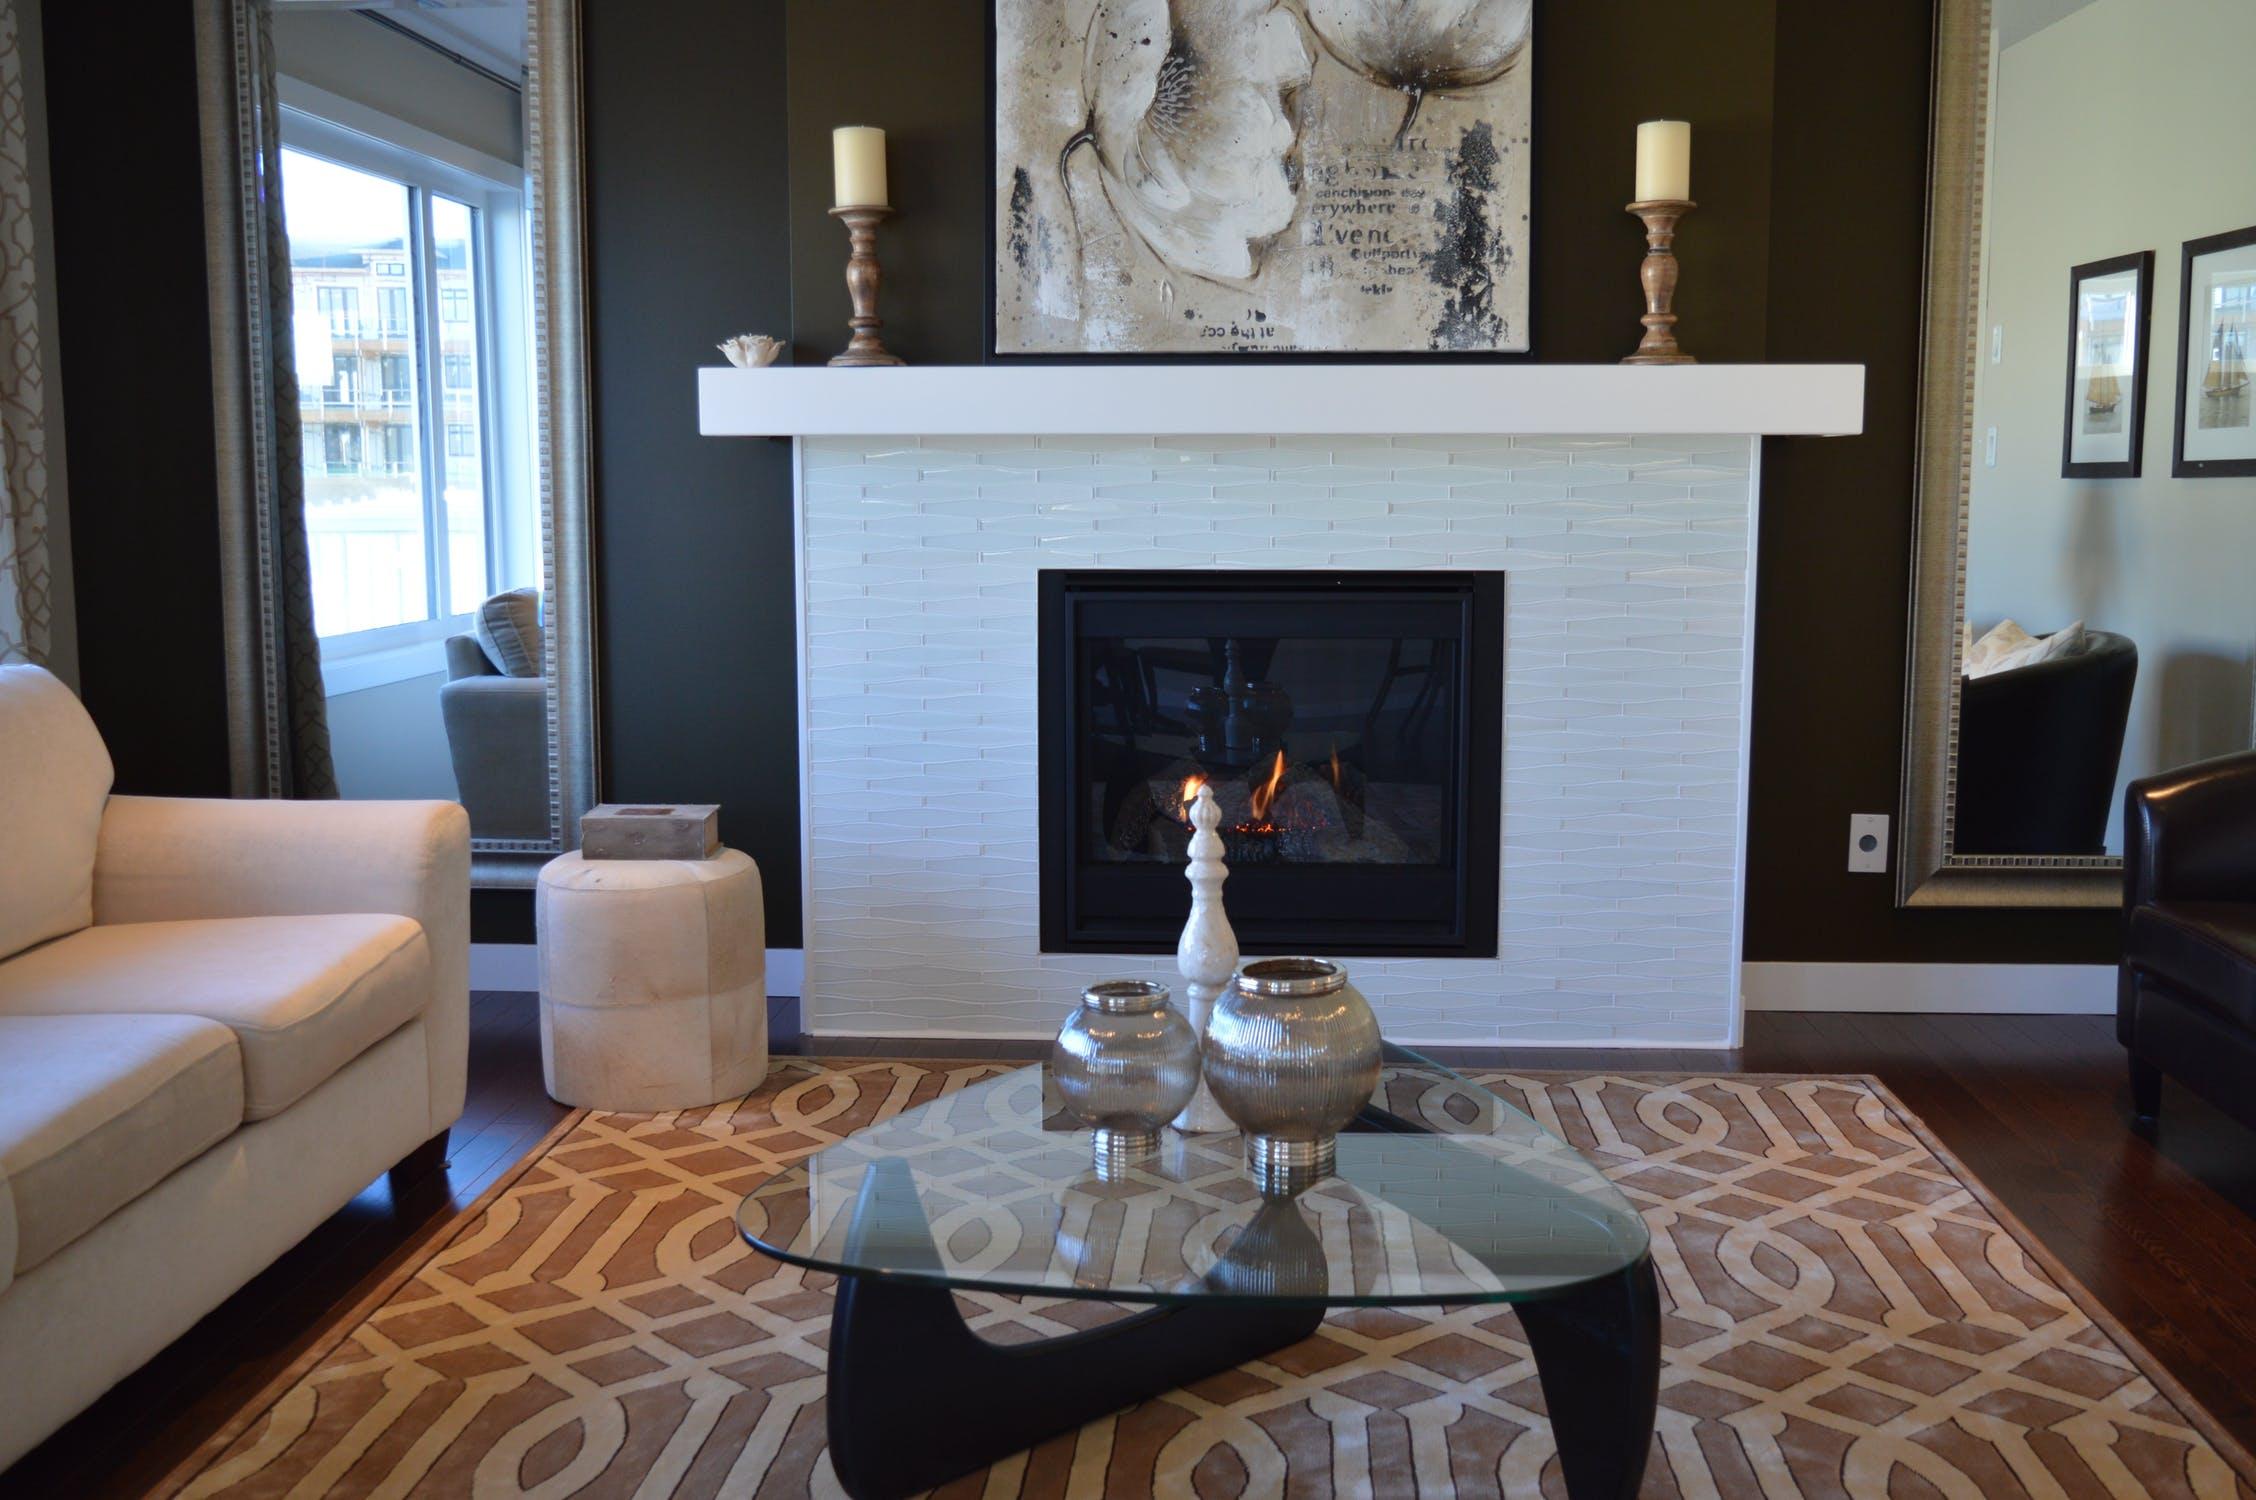 Image of a modern fireplace